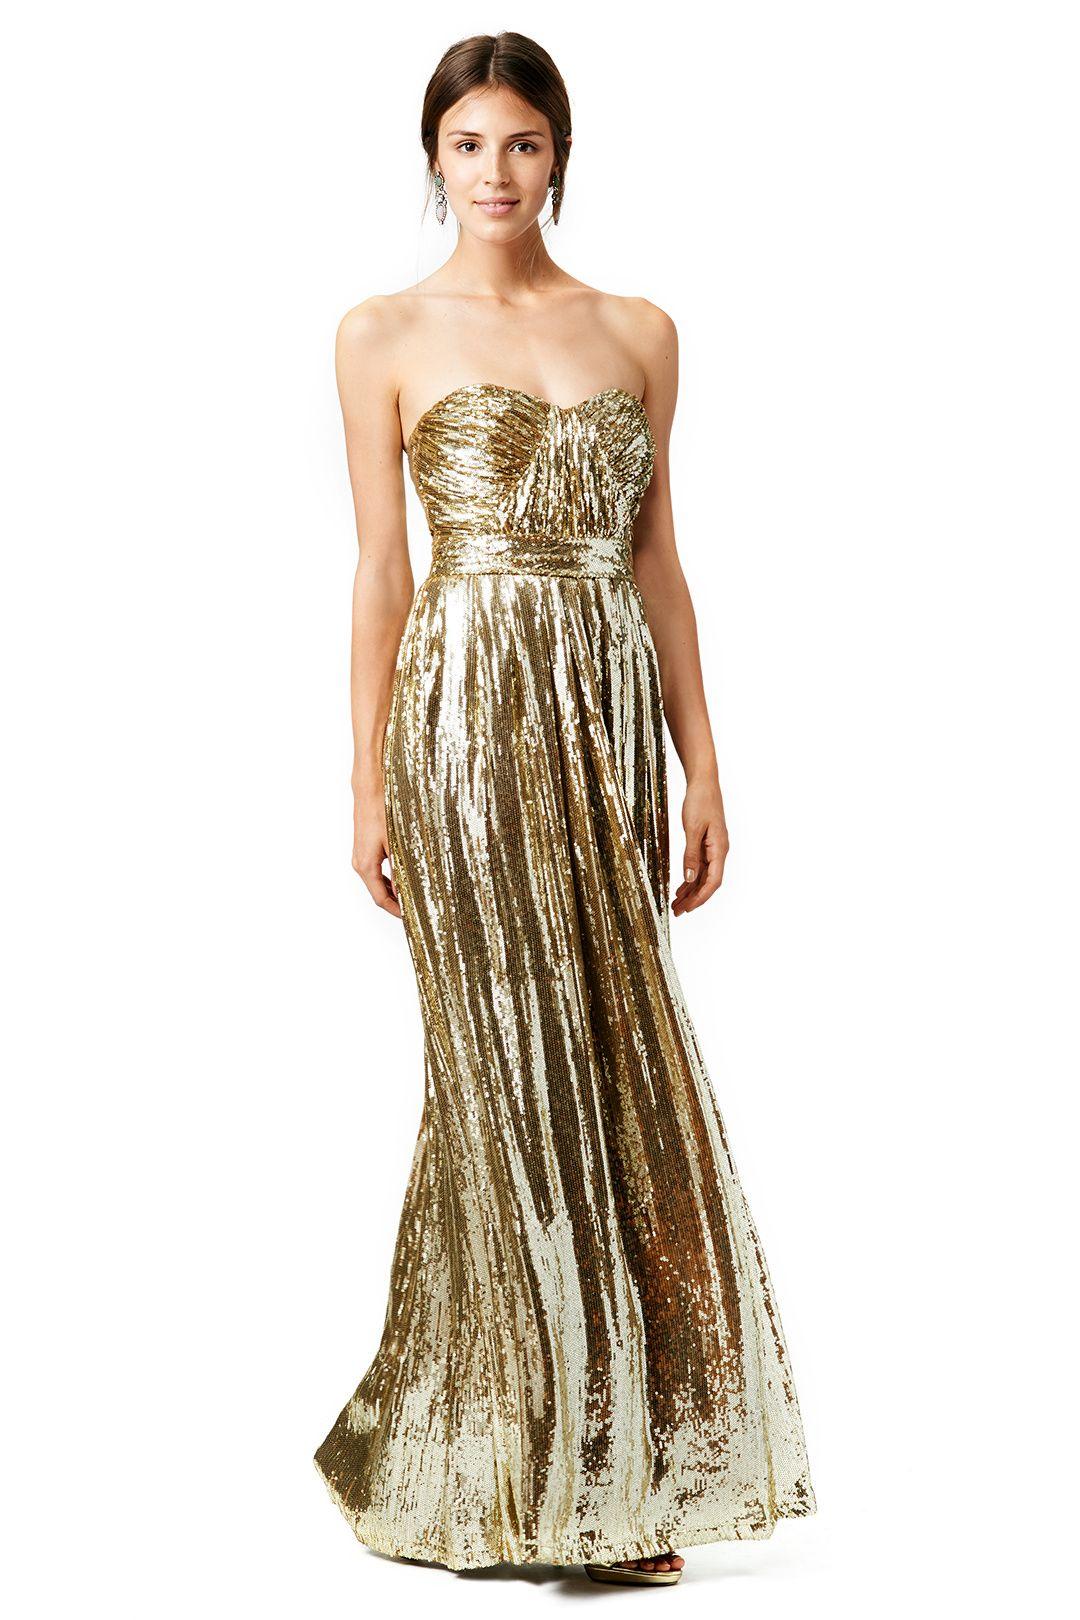 Badgley Mischka Screen Siren Gown $100.00 (4 Day Rental) || Rent the ...